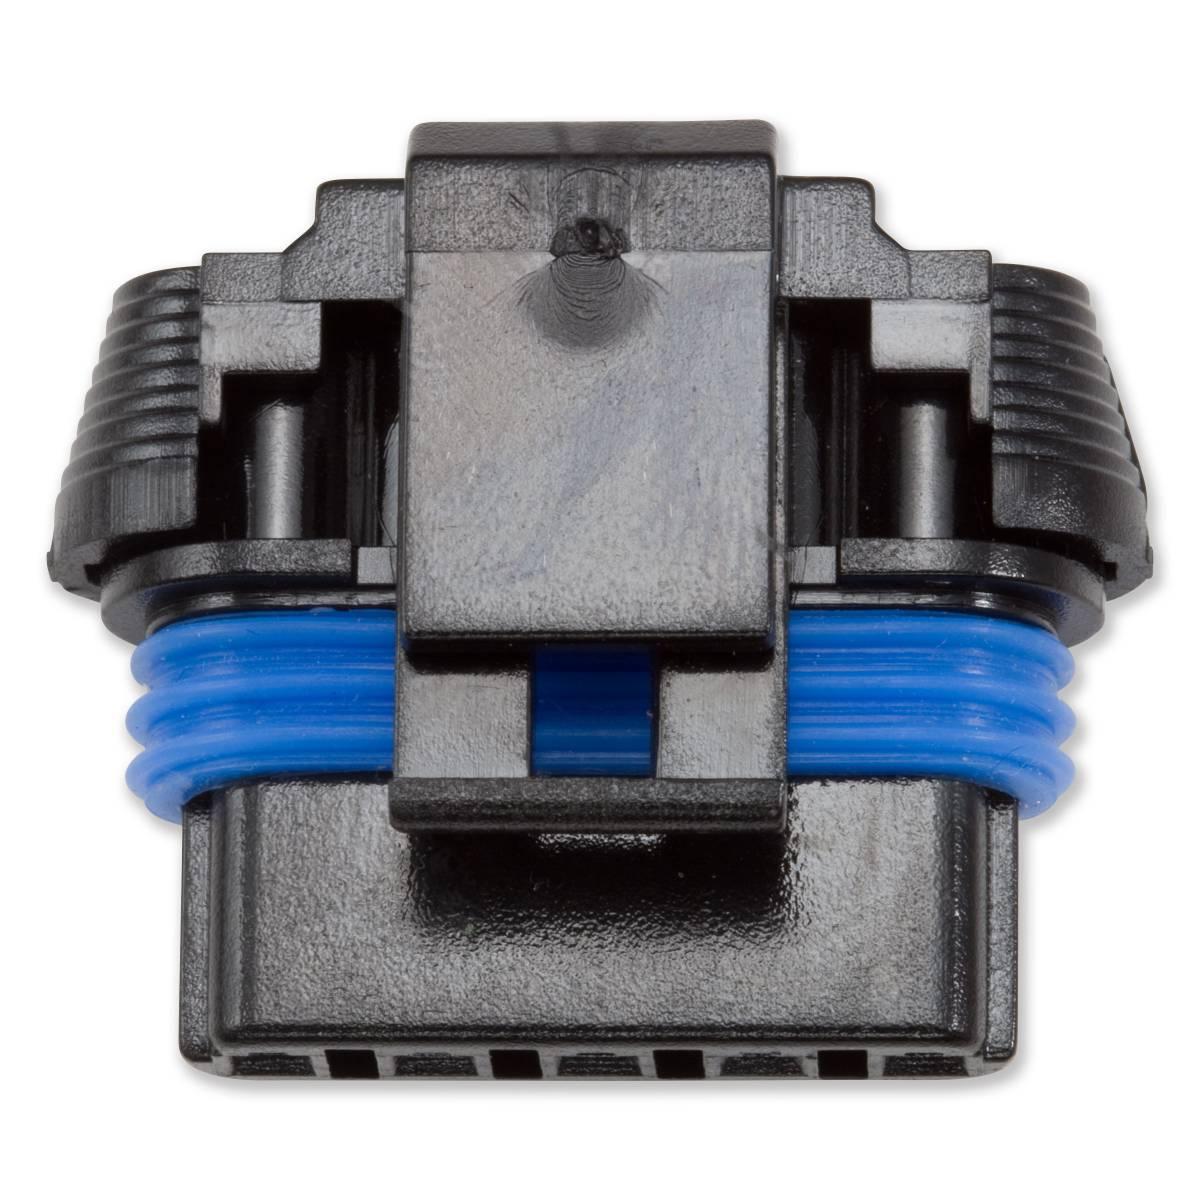 Alliant Power Ap0010 Valve Cover Harness Connector Repair Kit